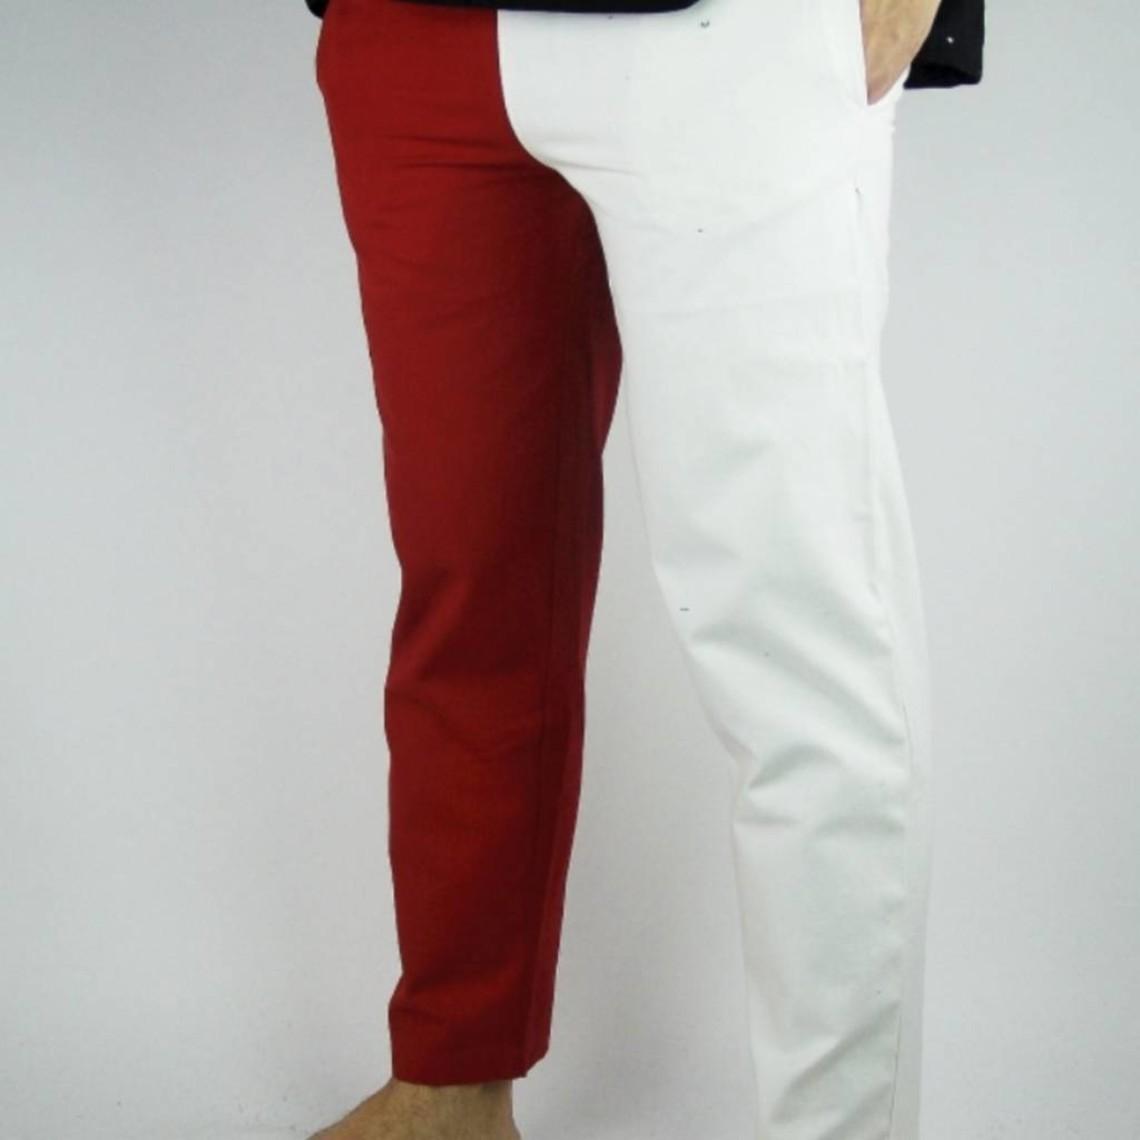 Leonardo Carbone Pantaloni Mi parti, rosso / bianco